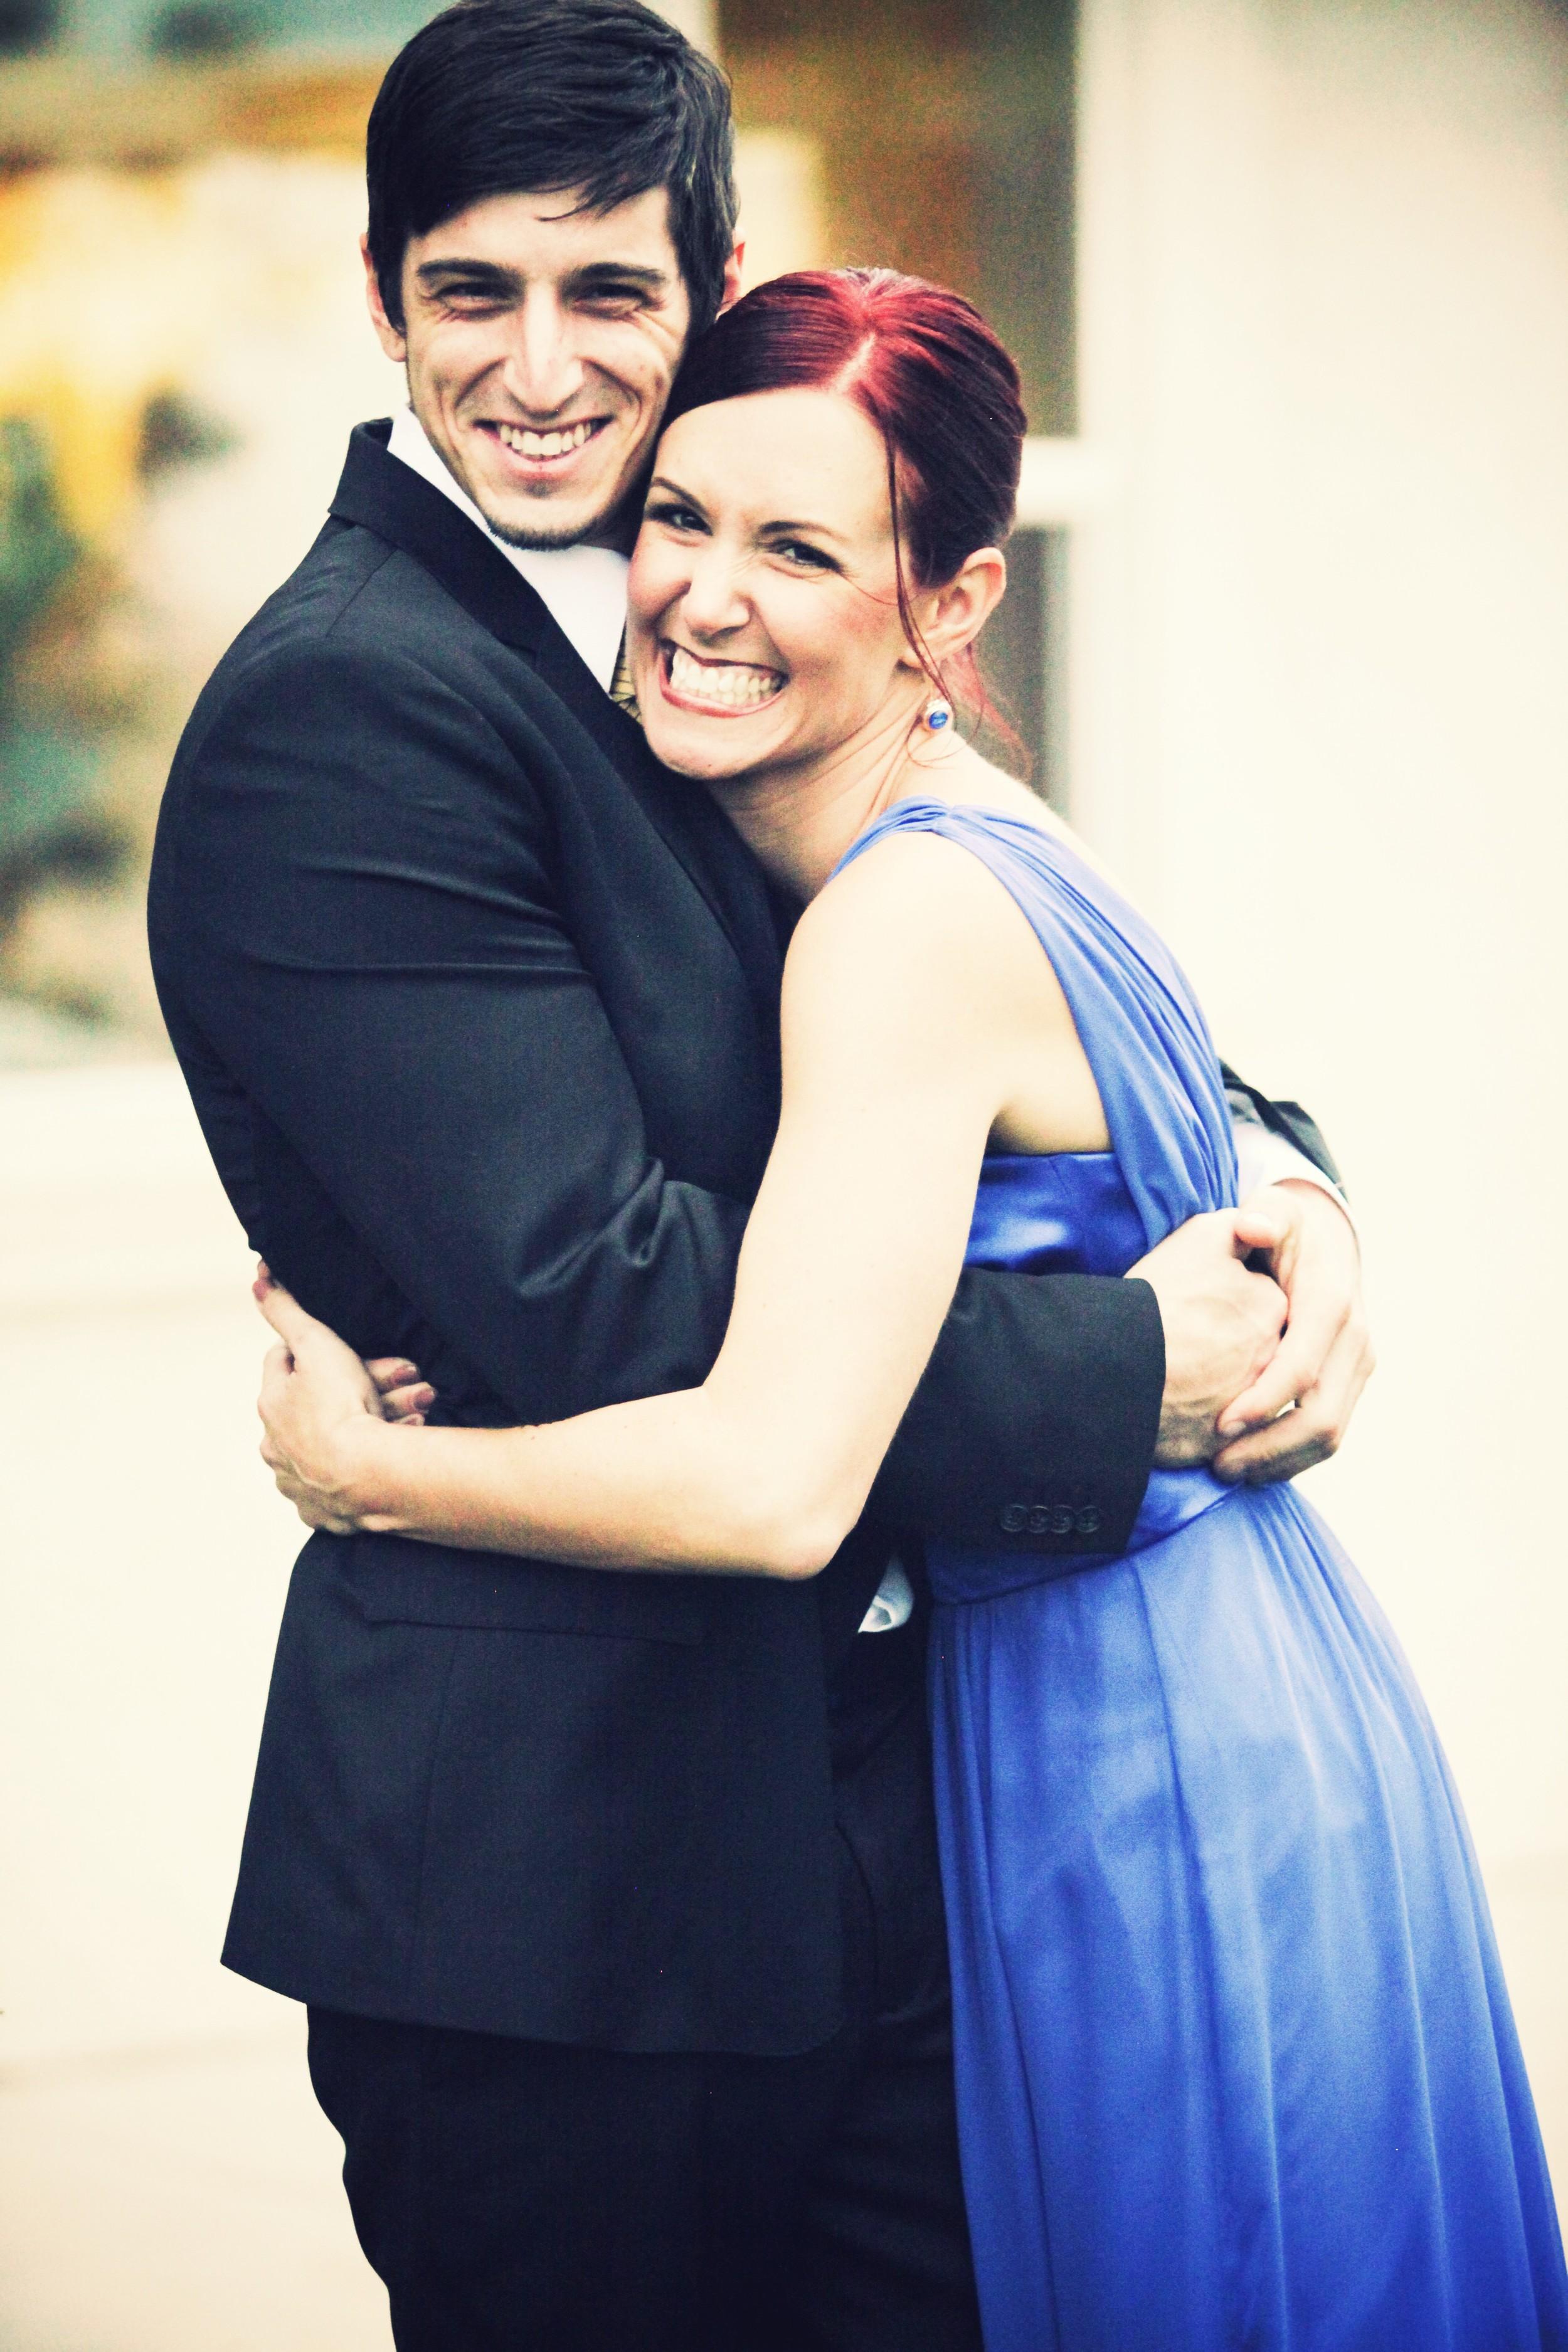 c and j wedding 9_effected.jpg